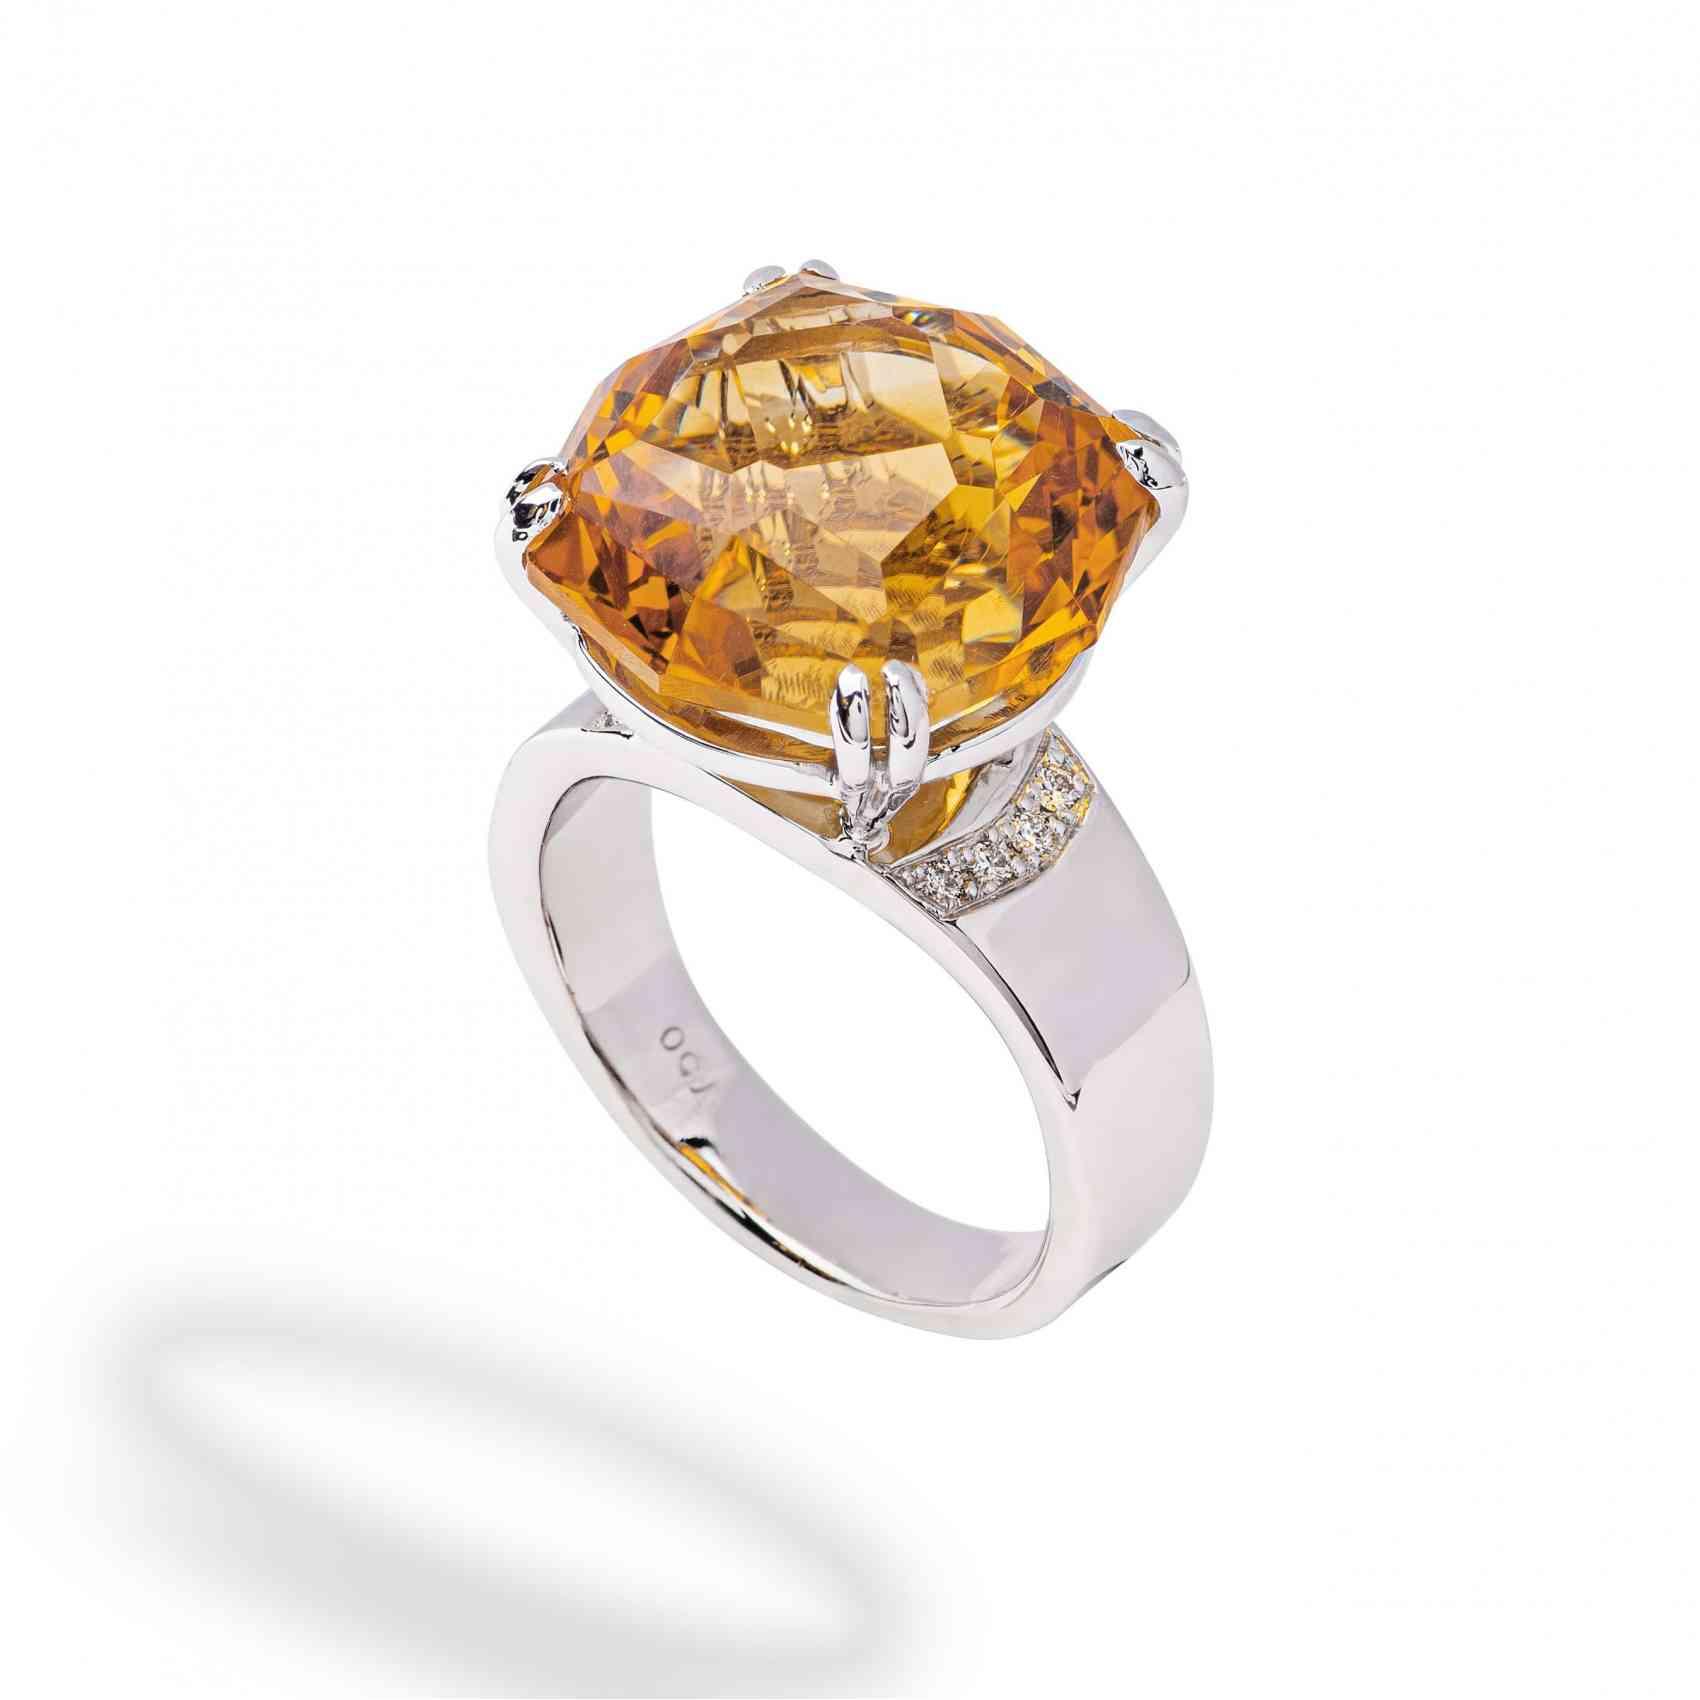 Inel din Aur Alb 18K cu Citrin Madeira si Diamante